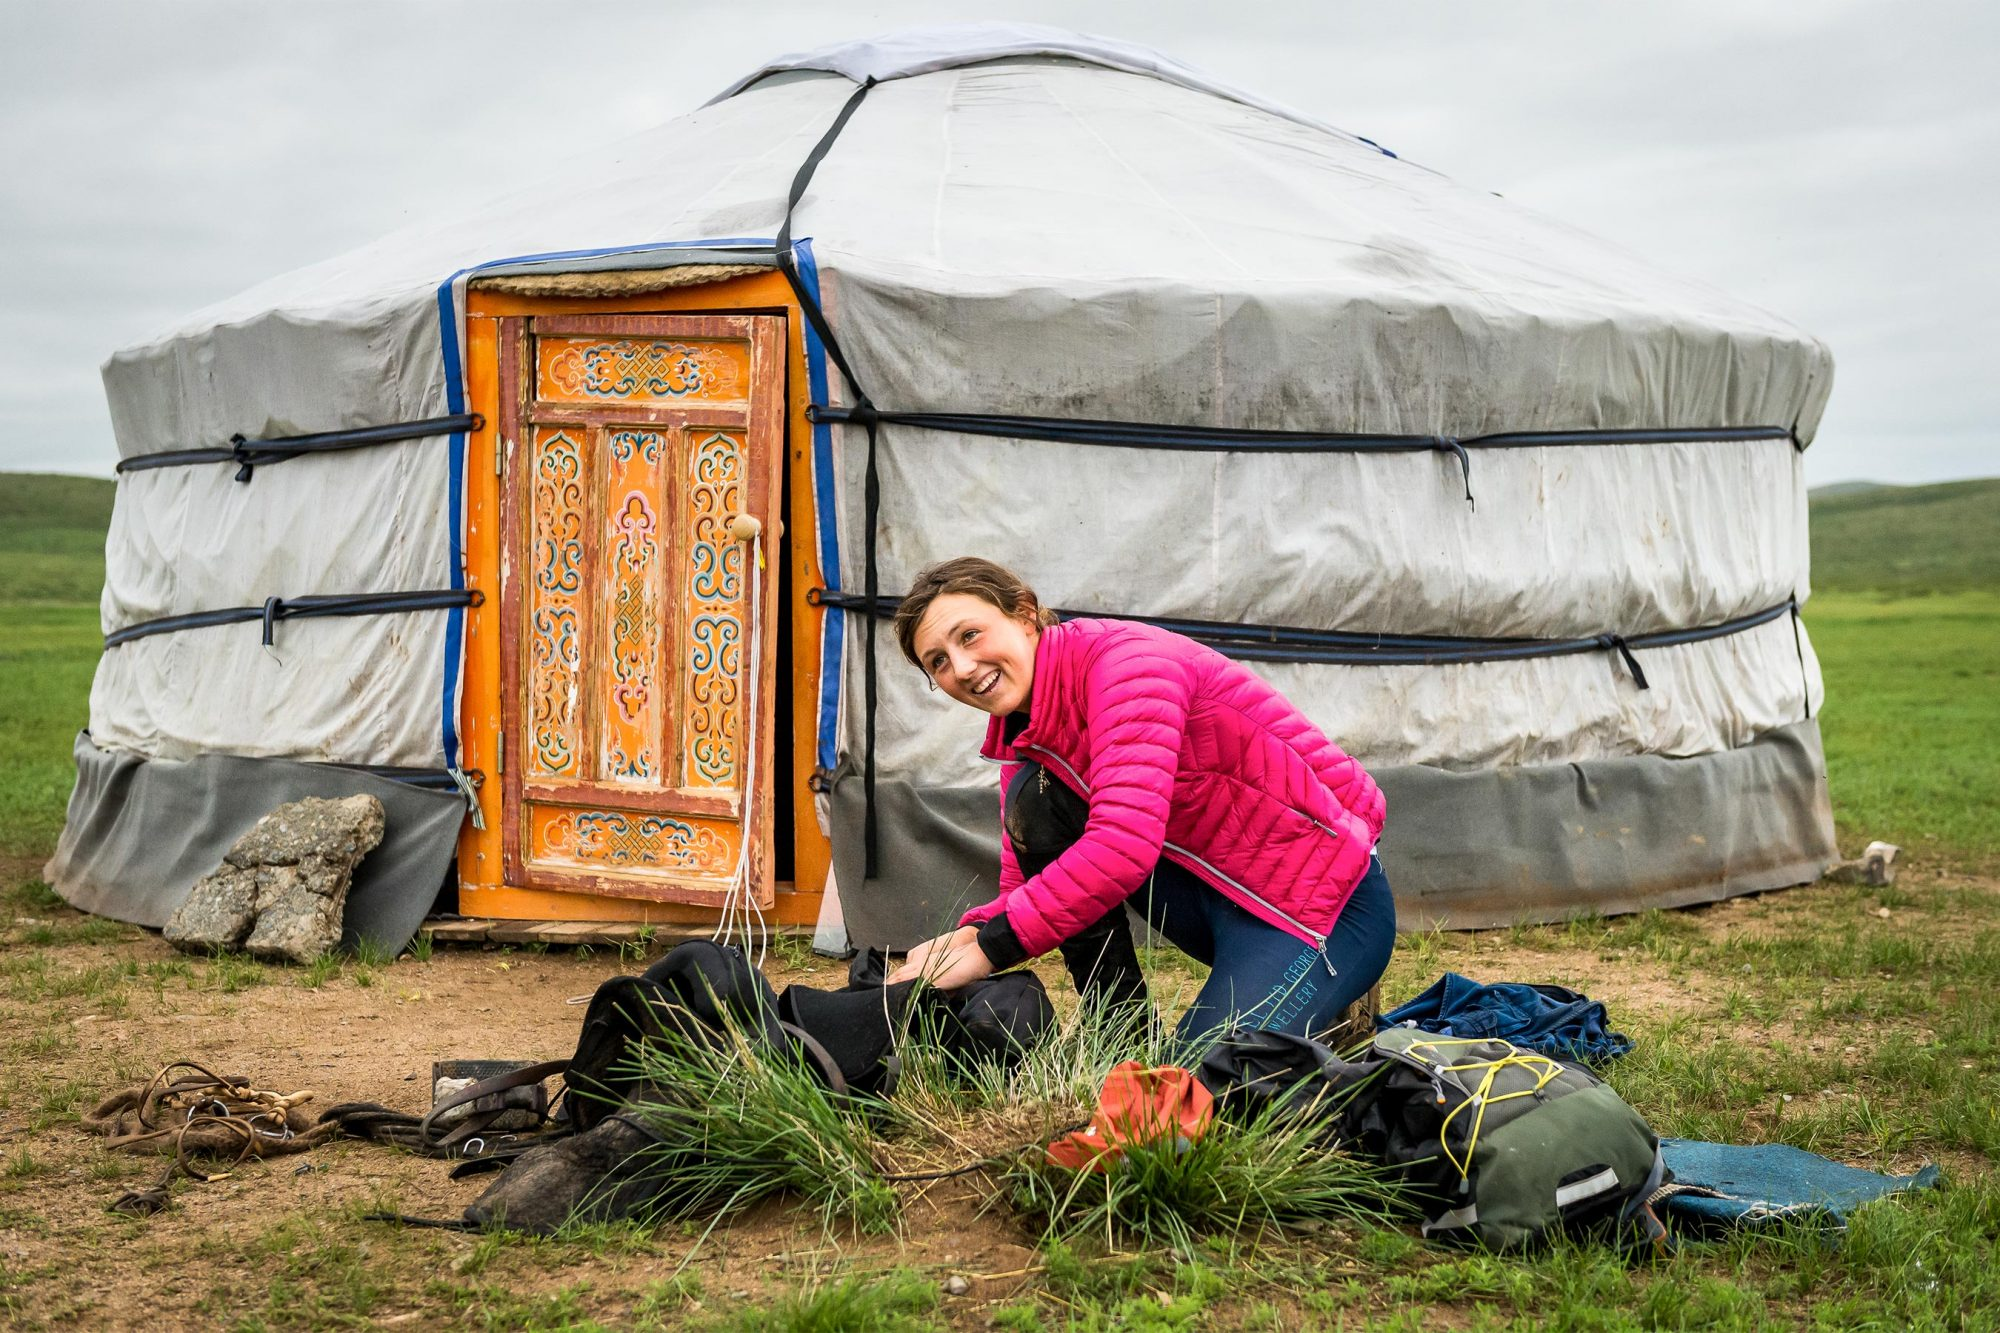 Lara Prior-Palmer and tent - photography credit Richard Dunwoody